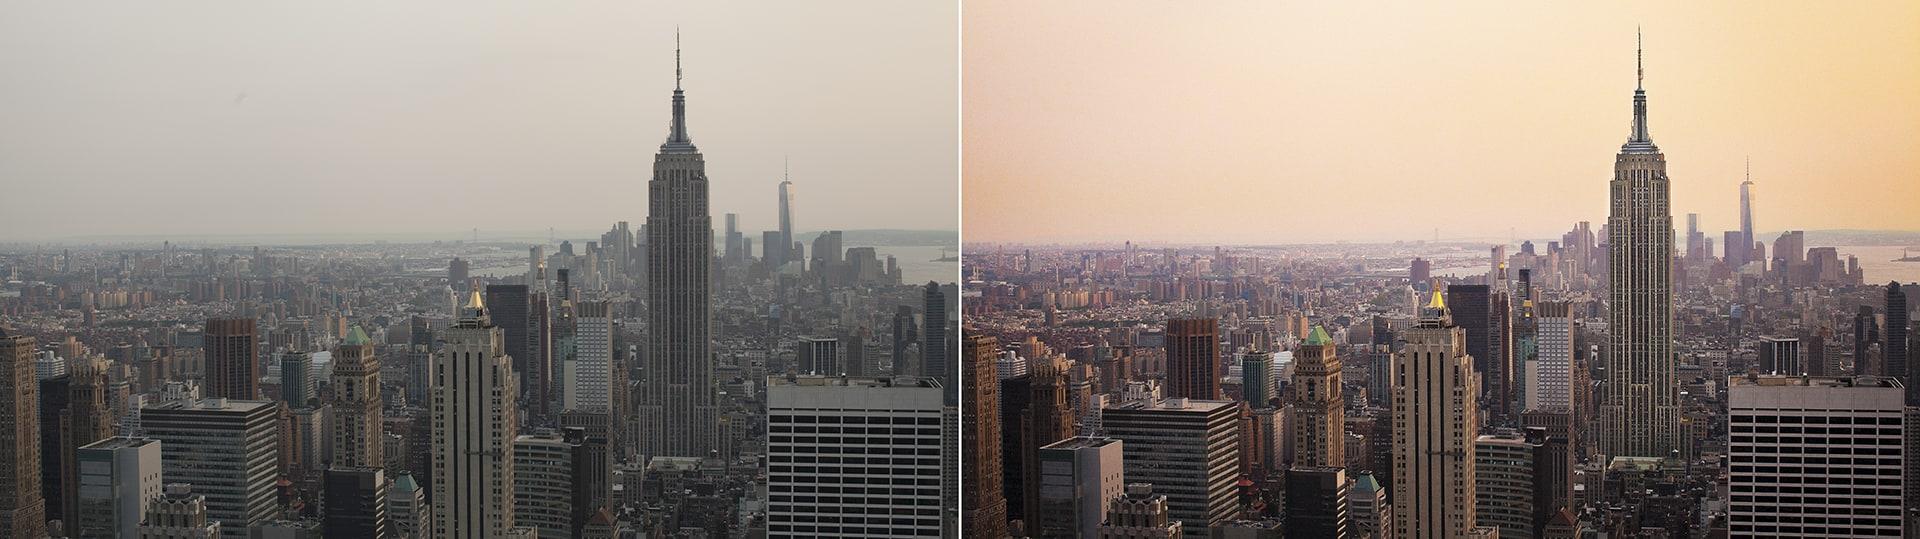 tuto lightroom débutant paysage urbain new york avant apres